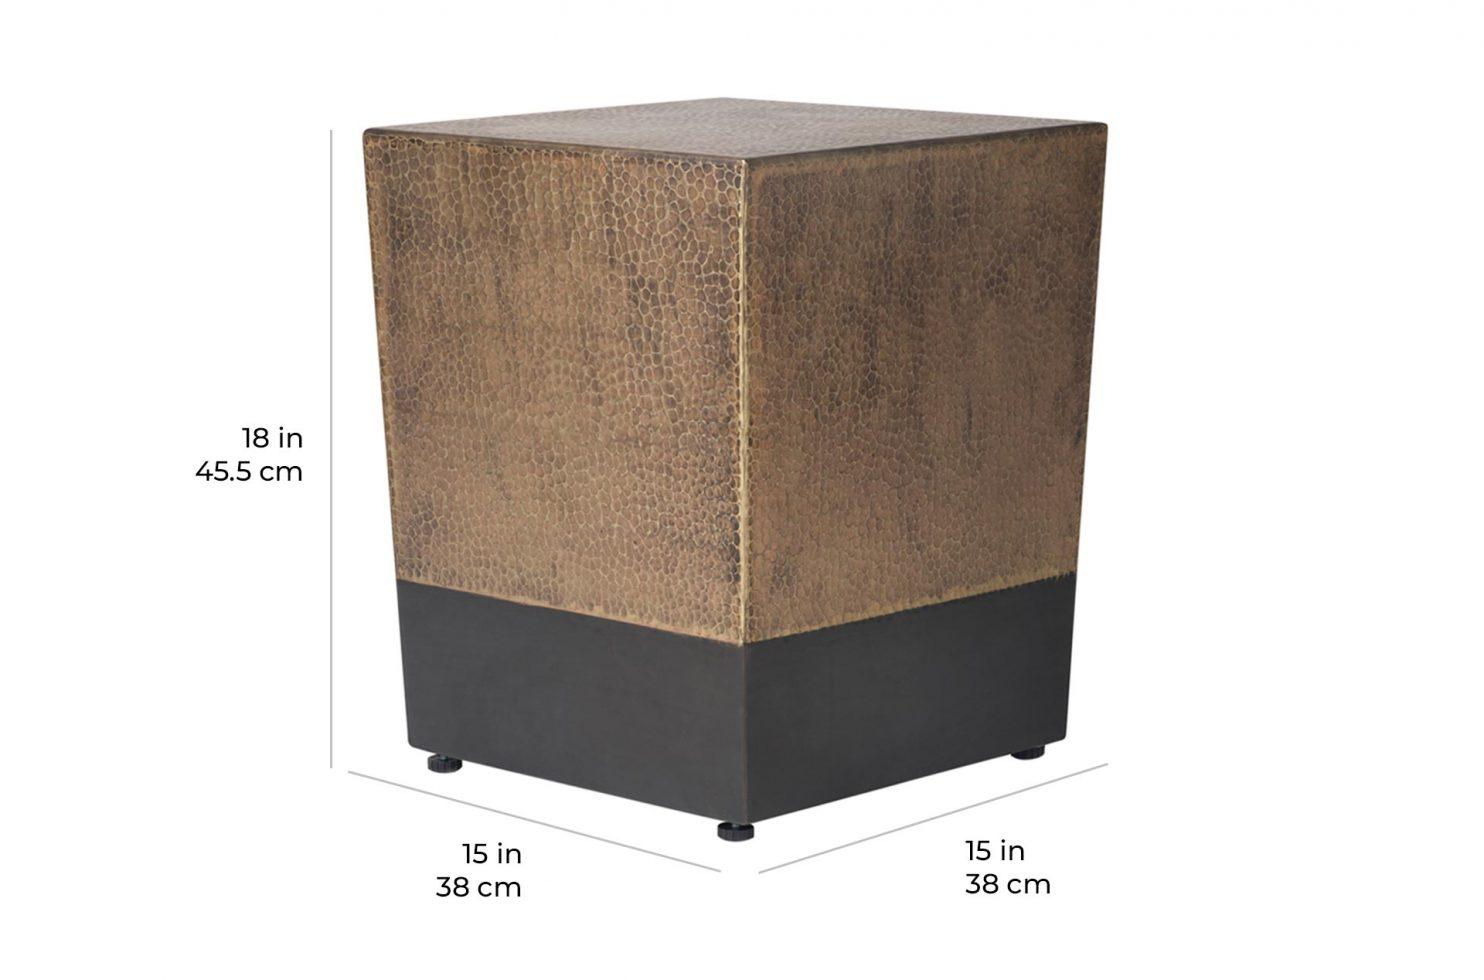 ingot cube 520FT006P2 scale dims